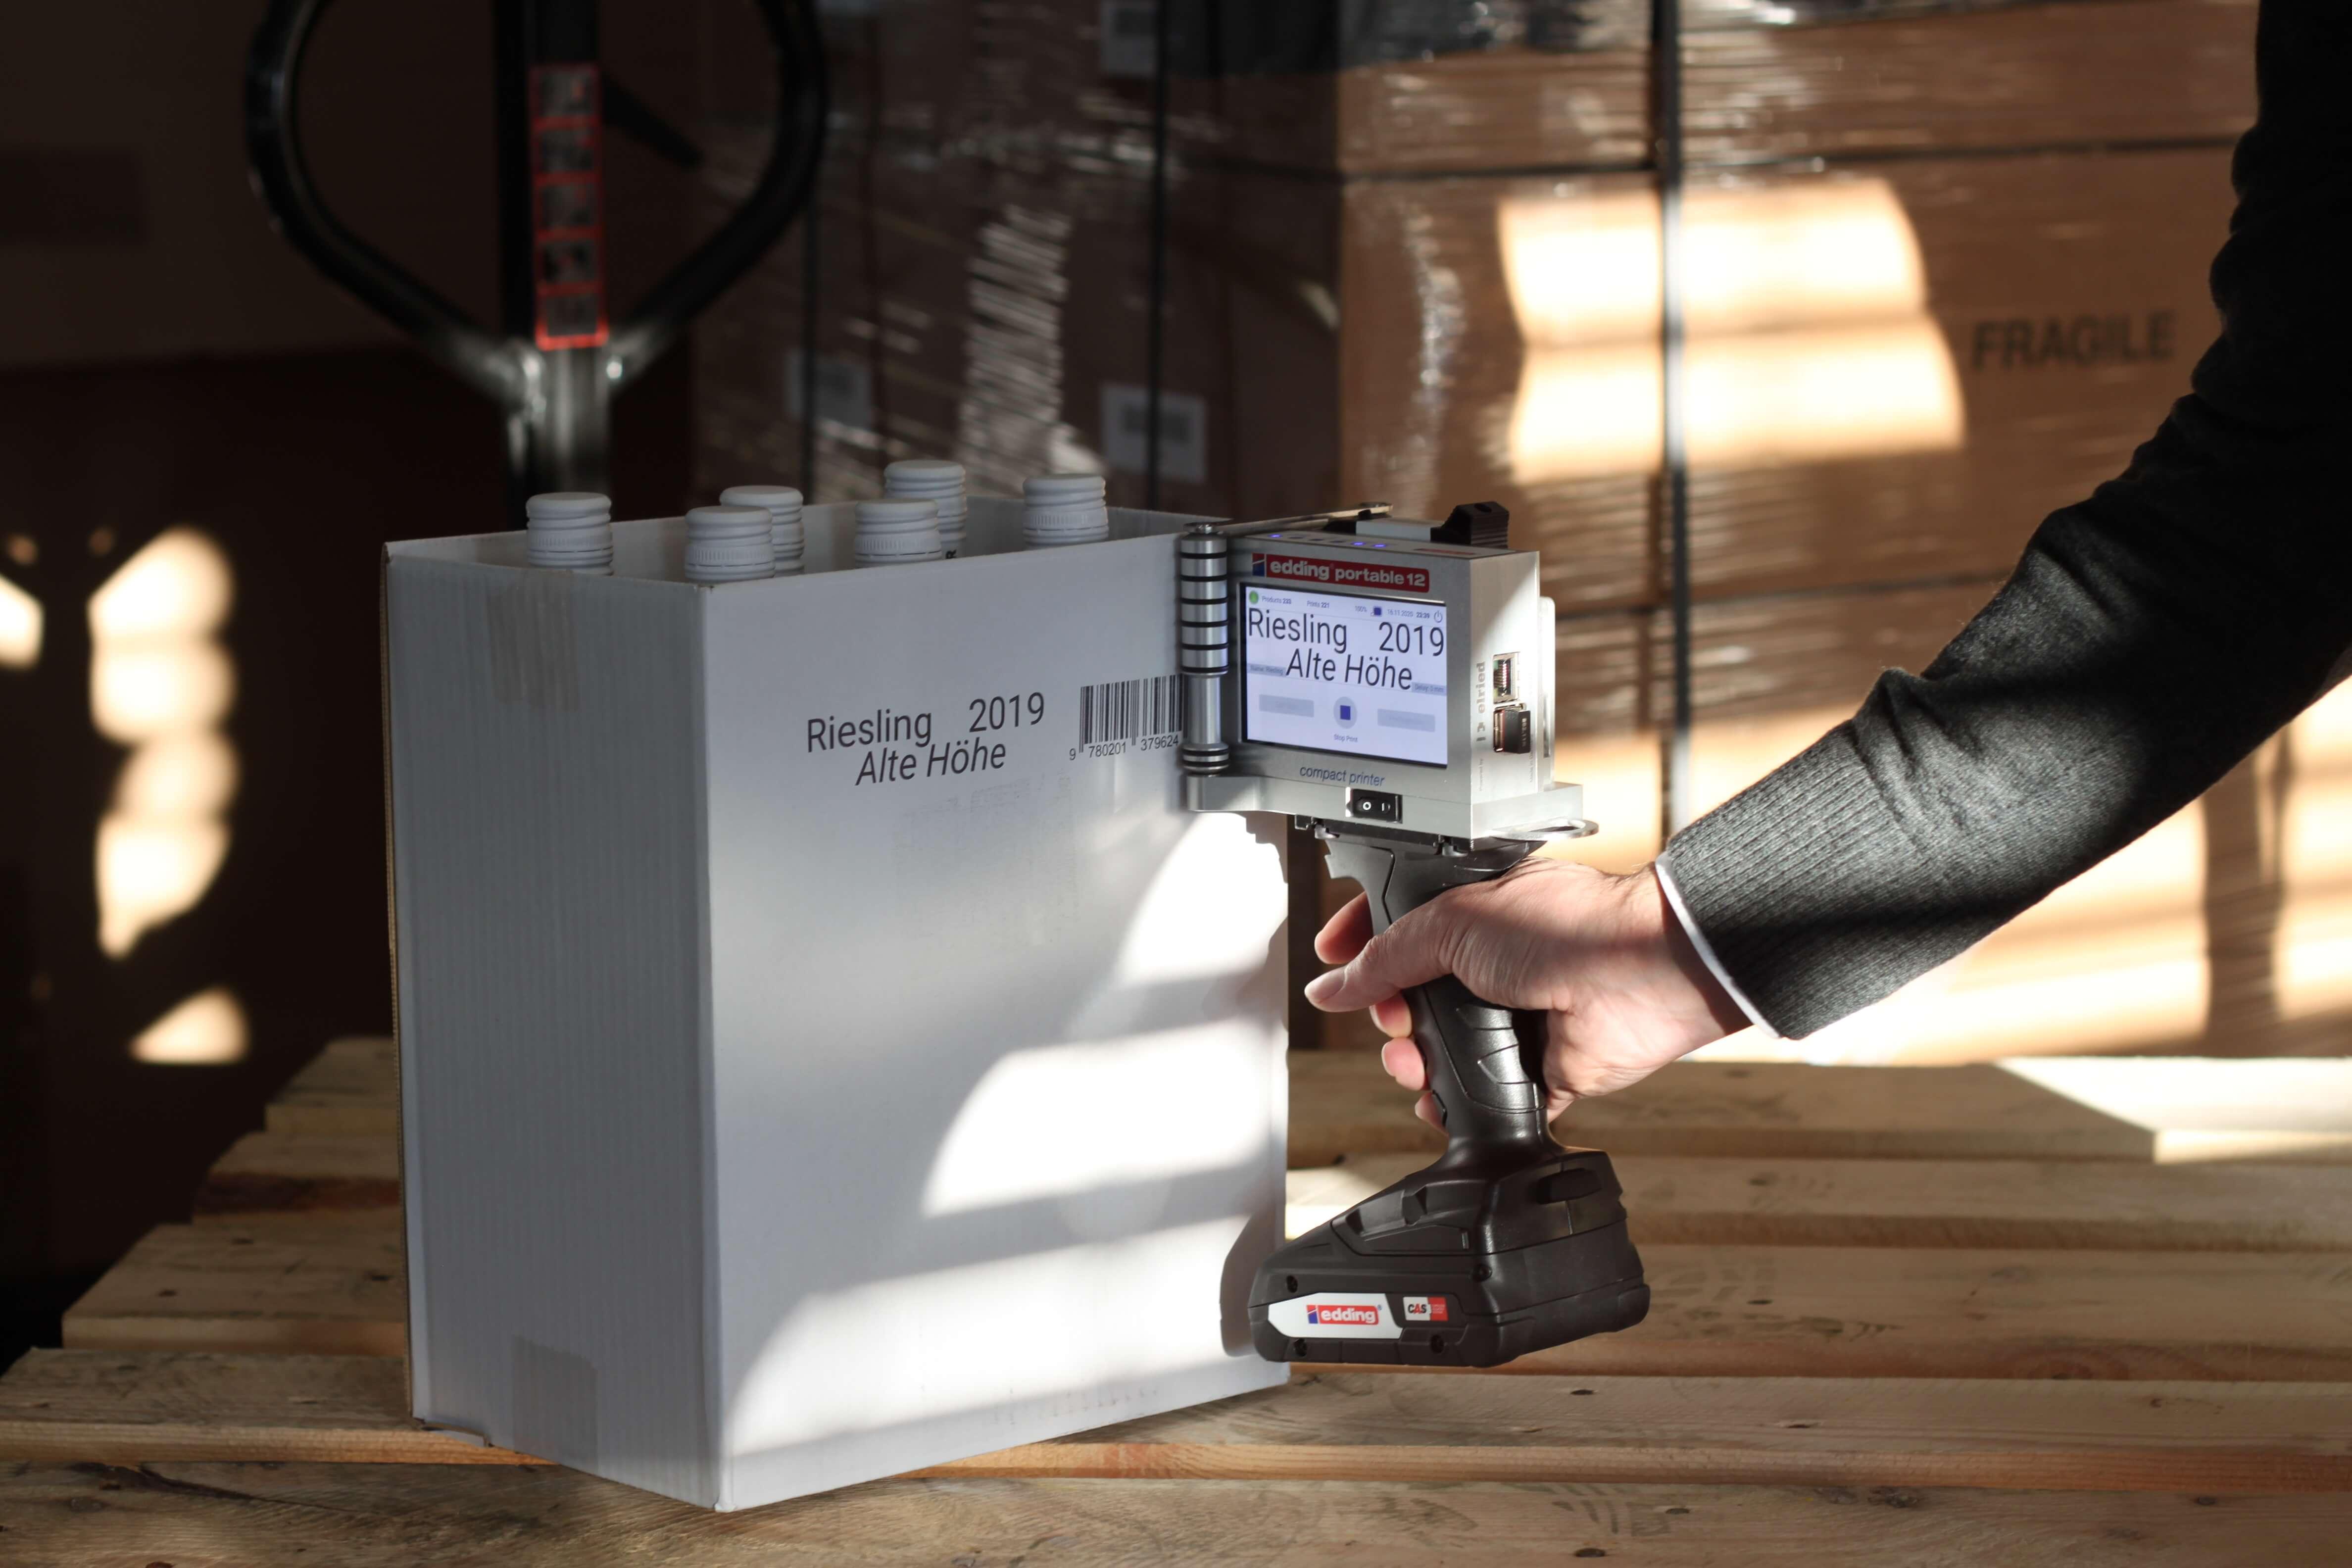 edding portable 12 printing on wine boxes